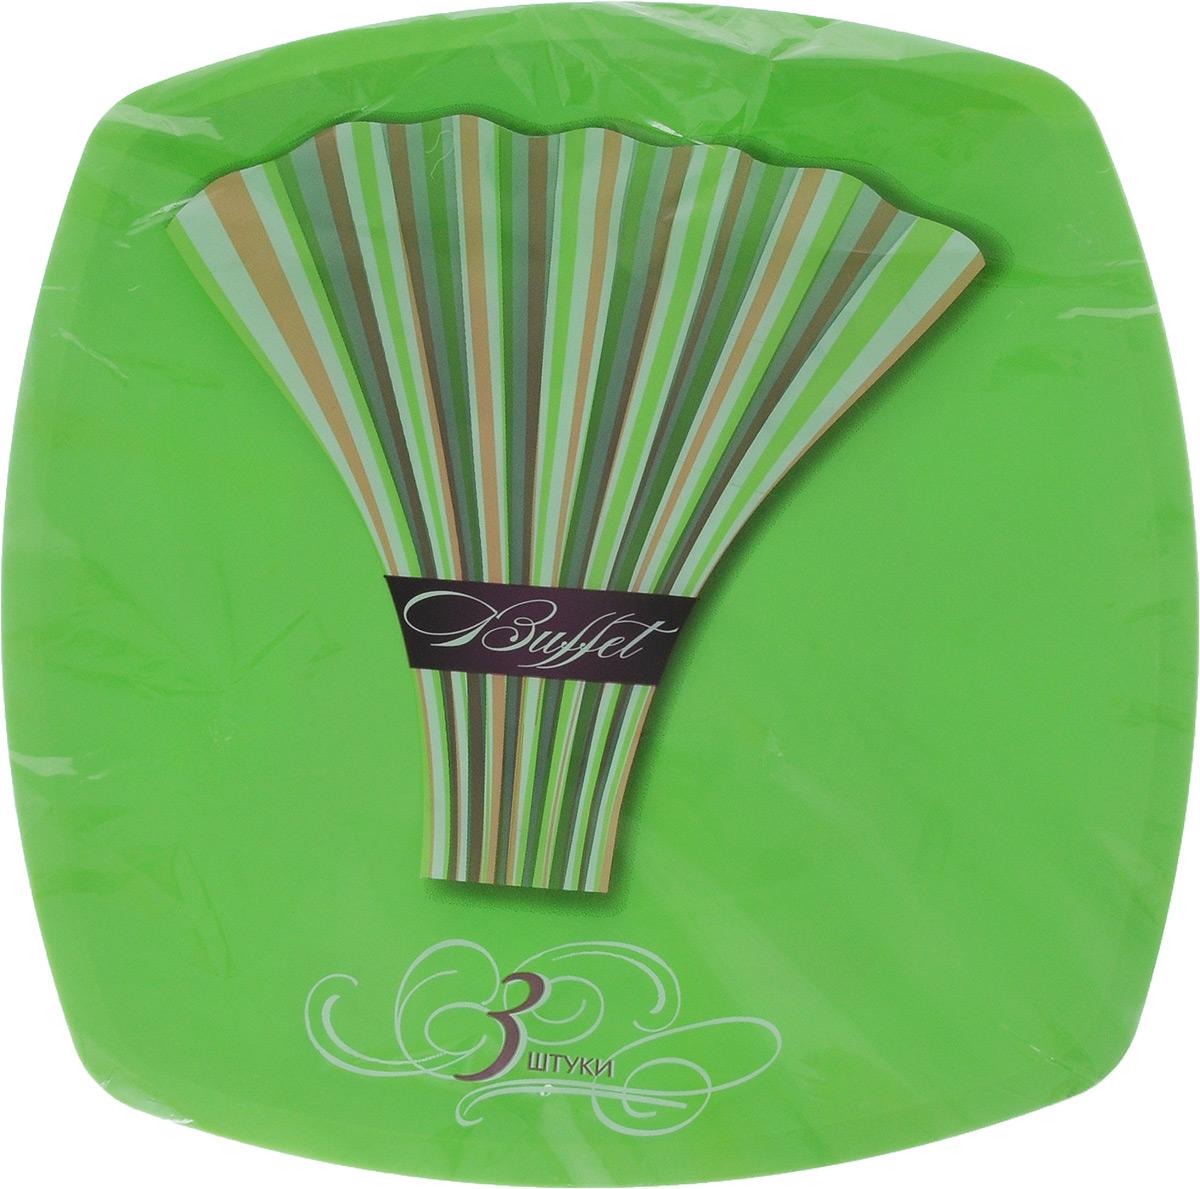 "Набор одноразовых тарелок ""Buffet"", цвет: зеленый, 30 х 30 см, 3 шт"